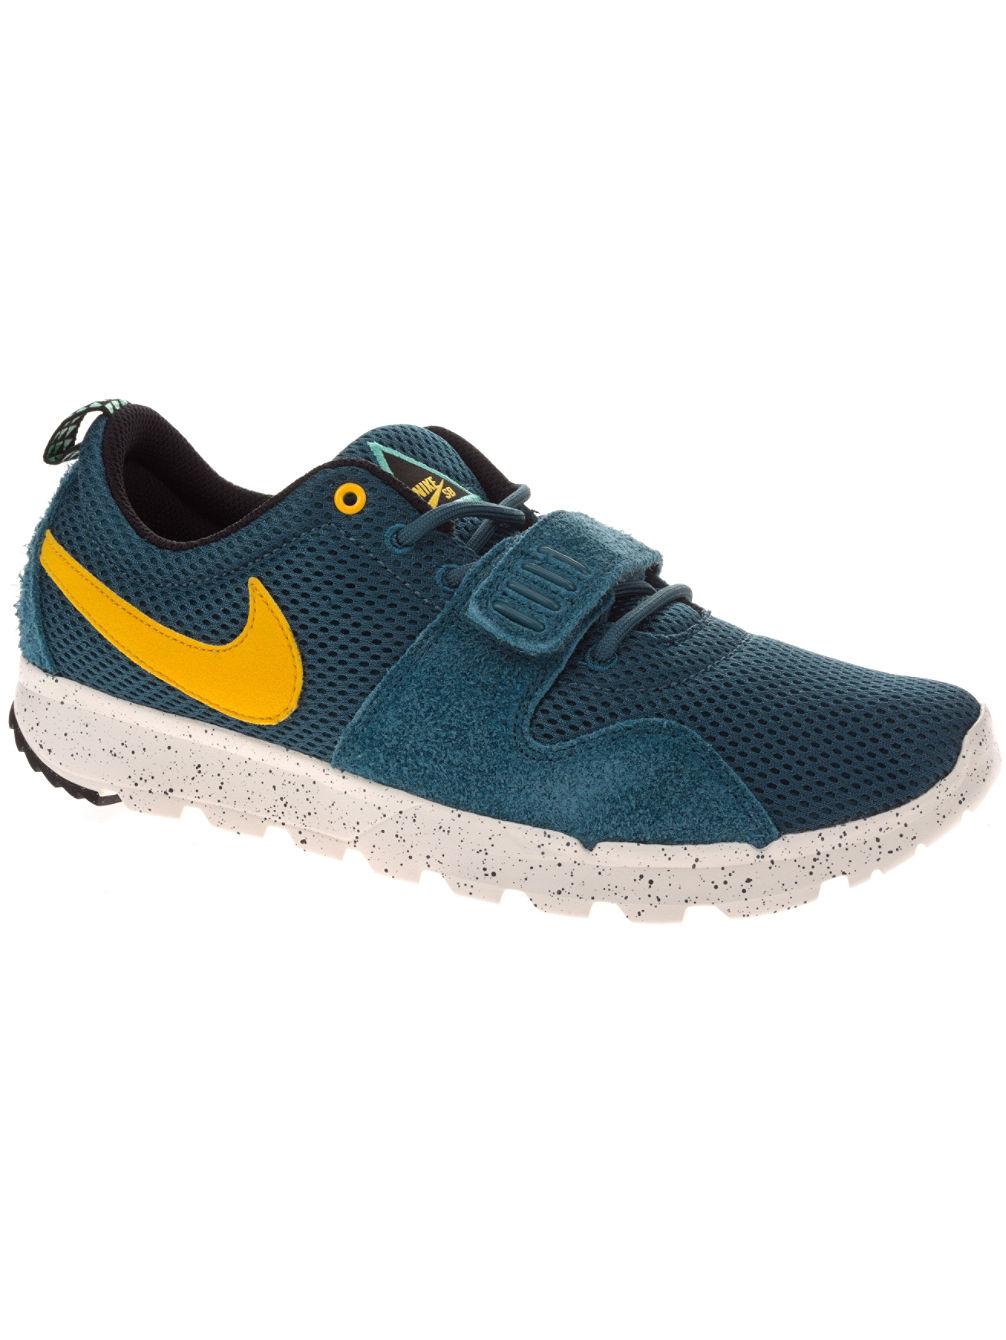 Nike Trainerendor Sneakers - nike - blue-tomato.com